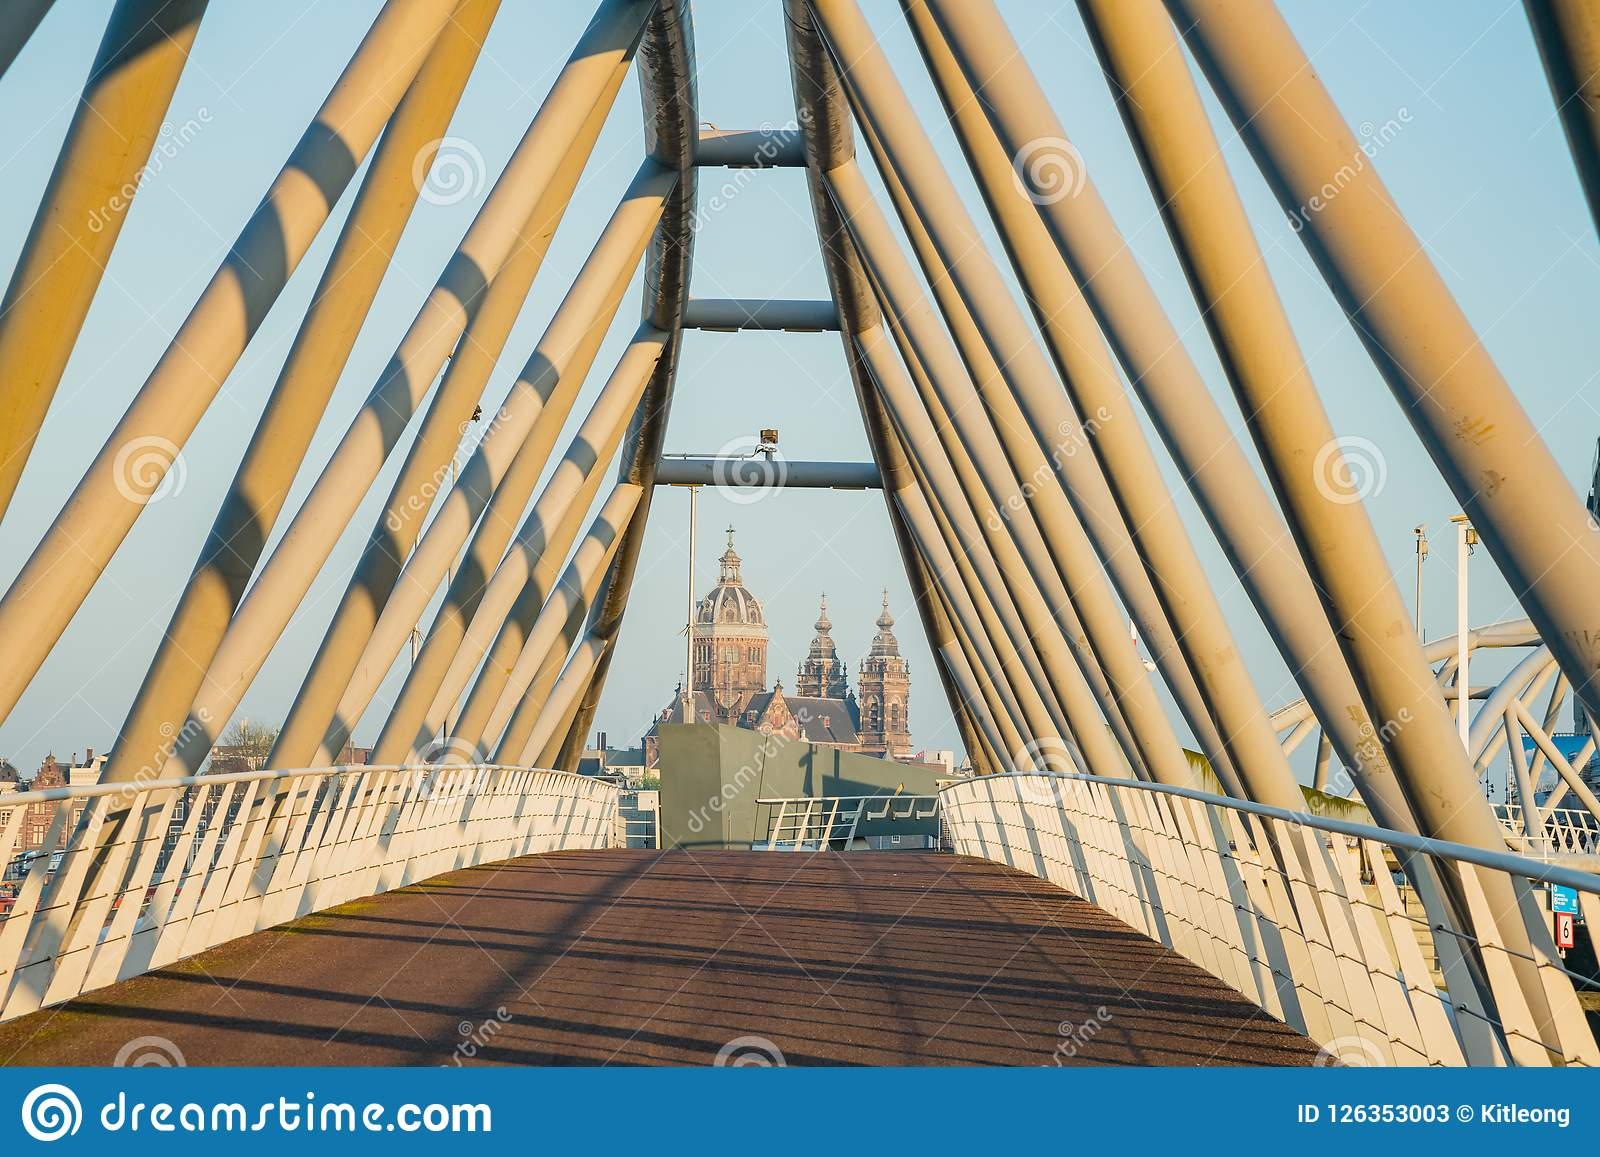 Church of Saint Nicholas and the Mr. JJ van der Veldebrug bridge